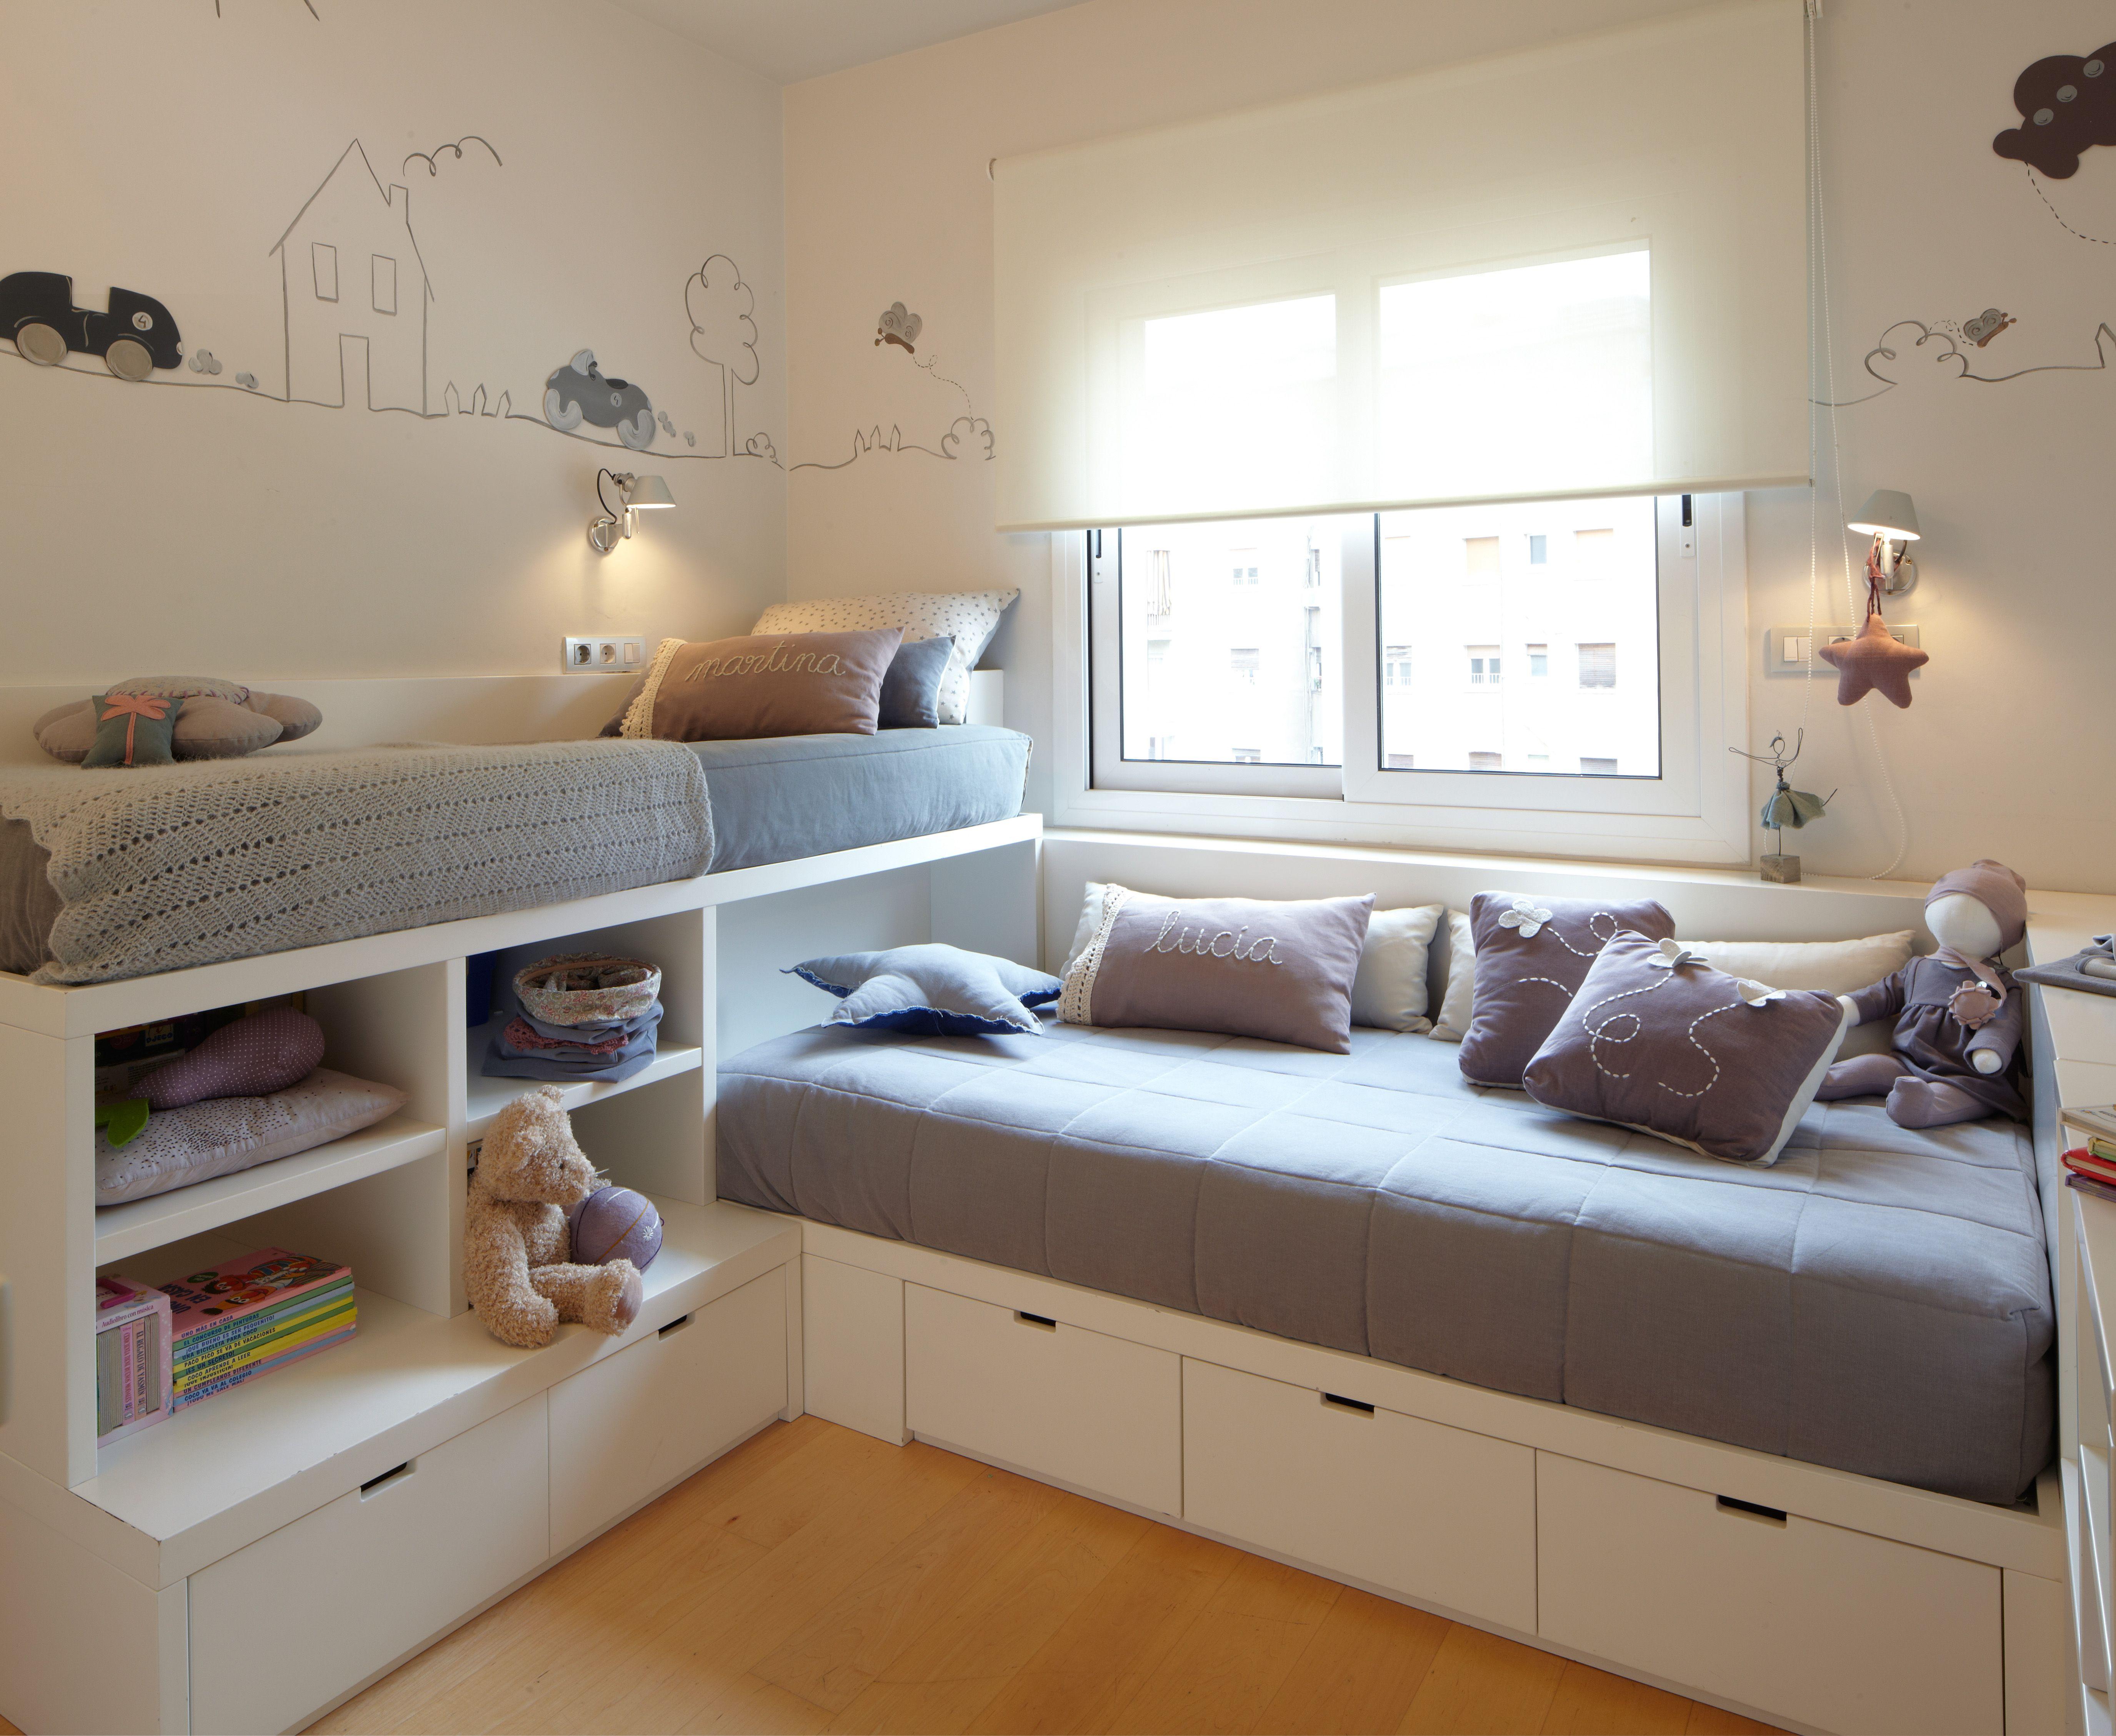 Kleine Slaapkamer Kind : Pin van shana wolfs op slaapkamer pinterest slaapkamer